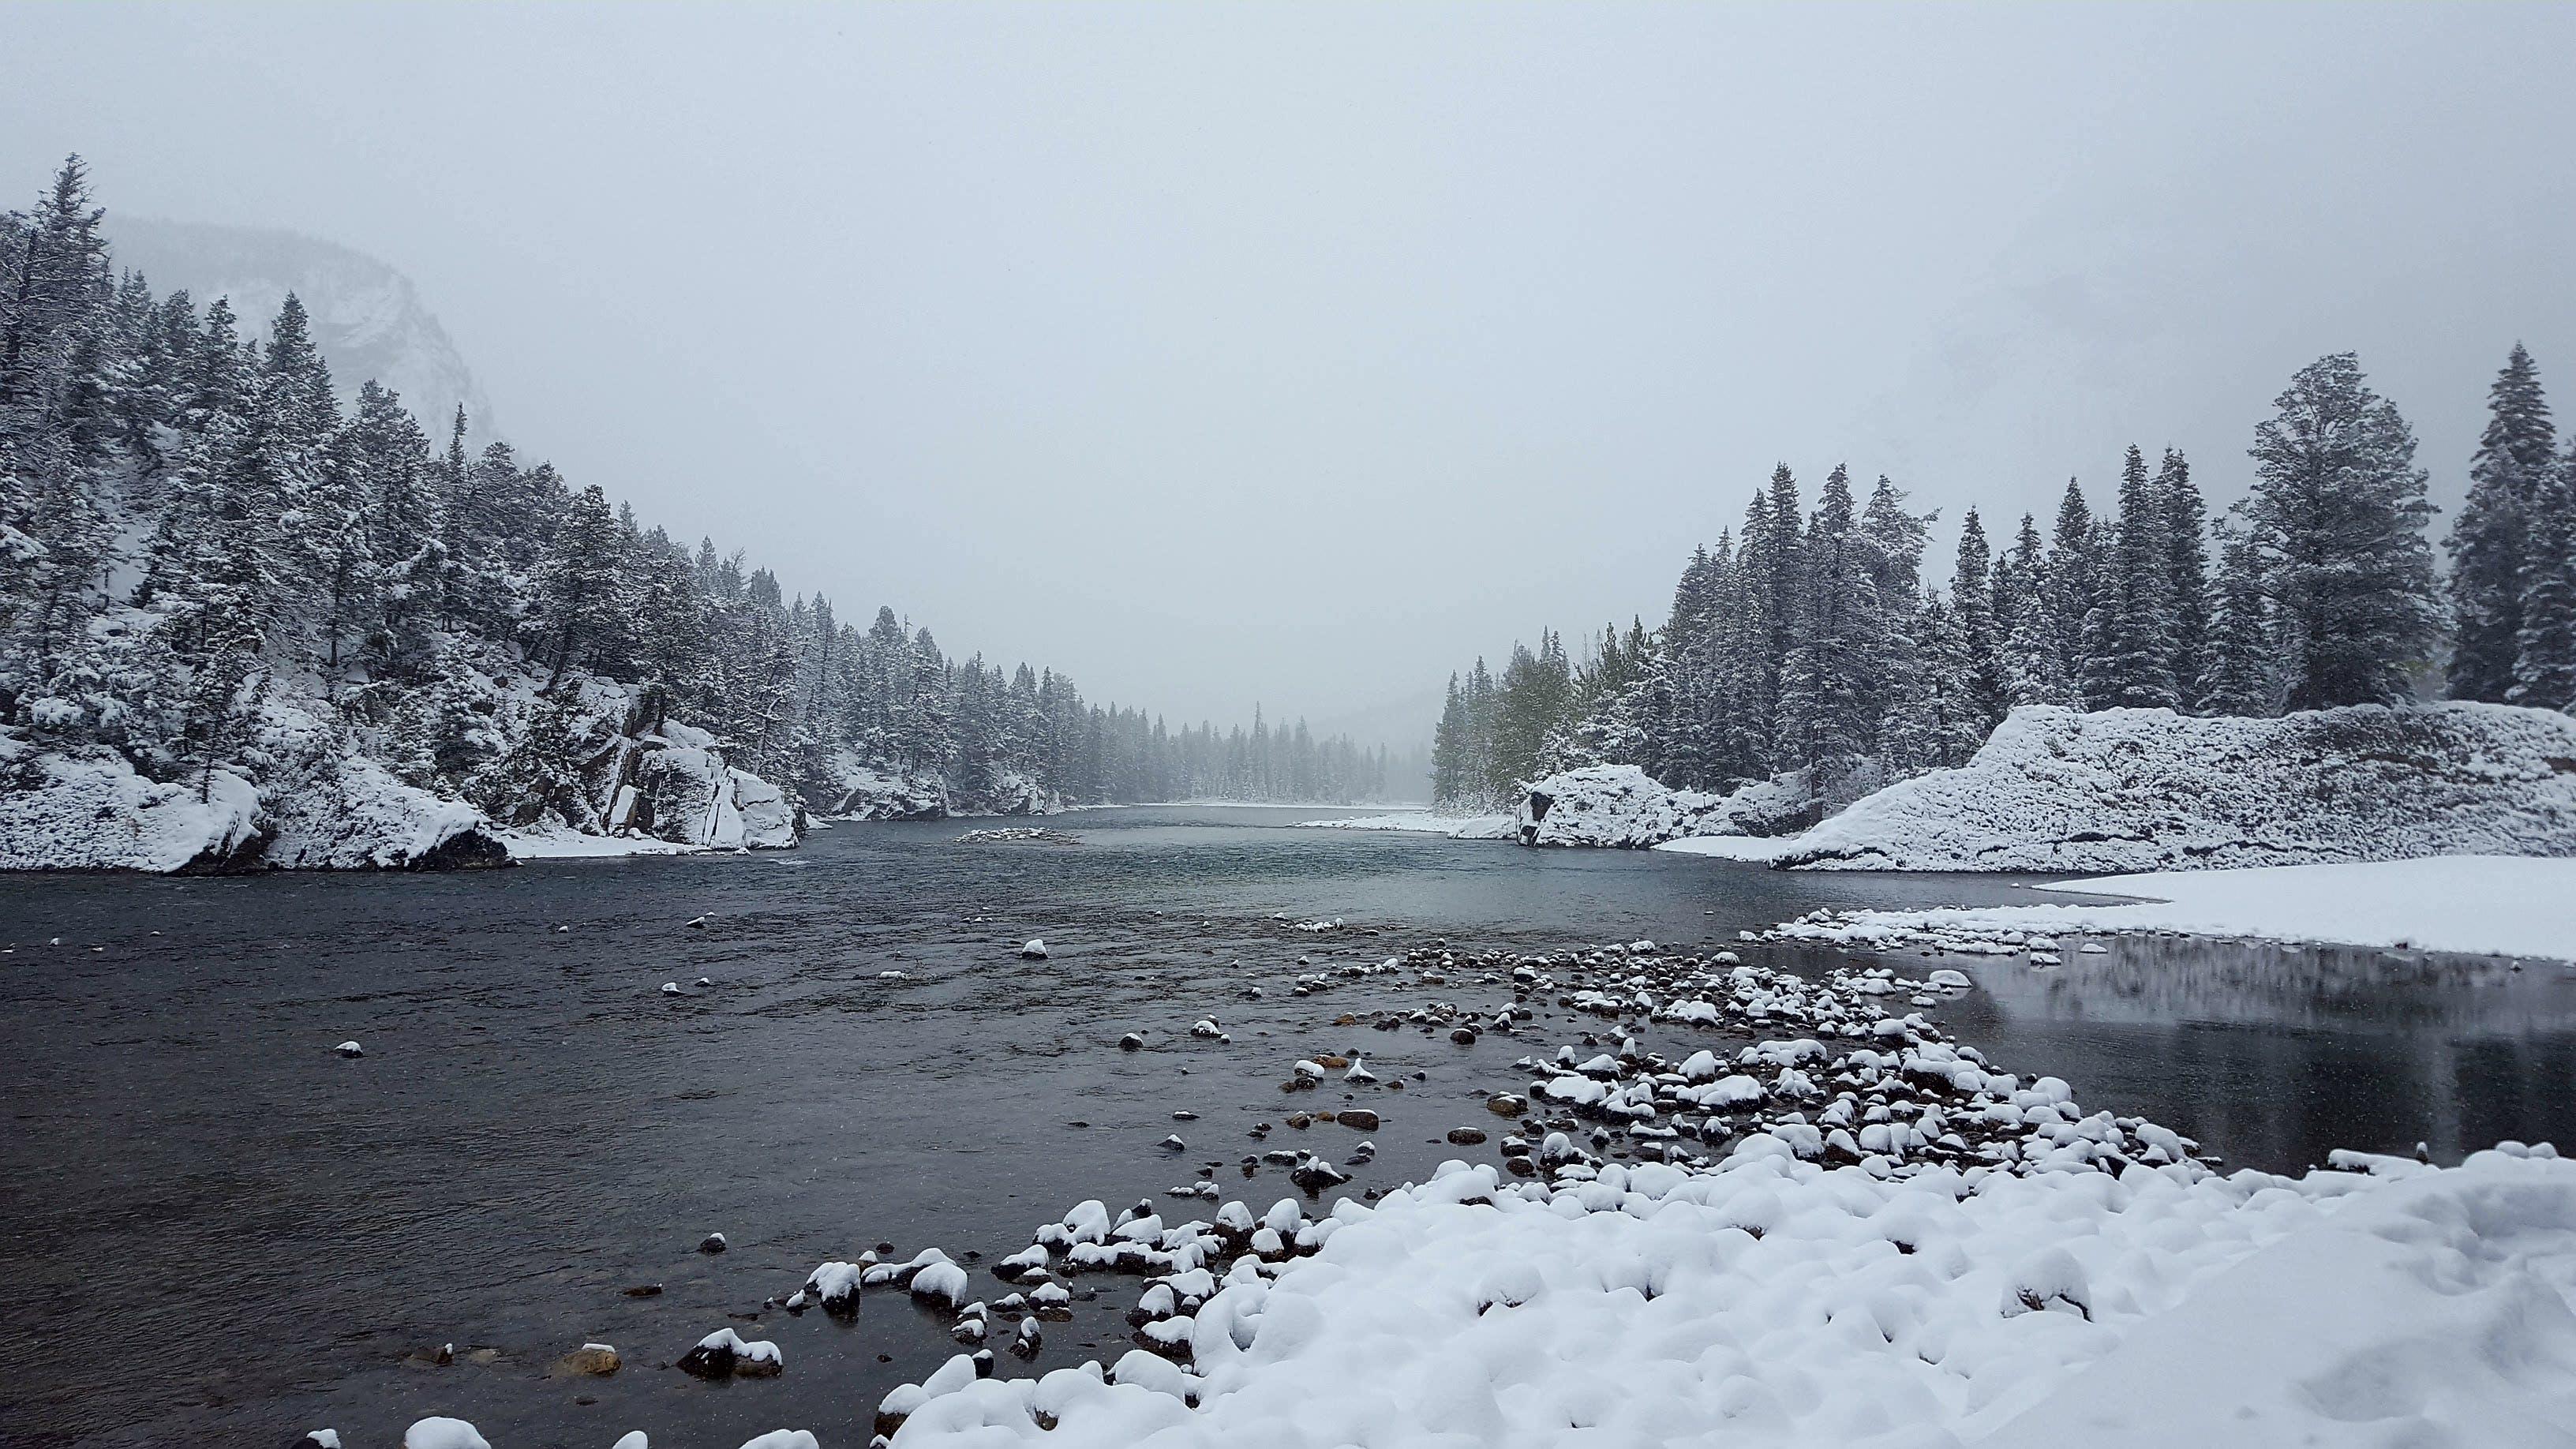 Free stock photo of #banff #canada #bowlake #landscape